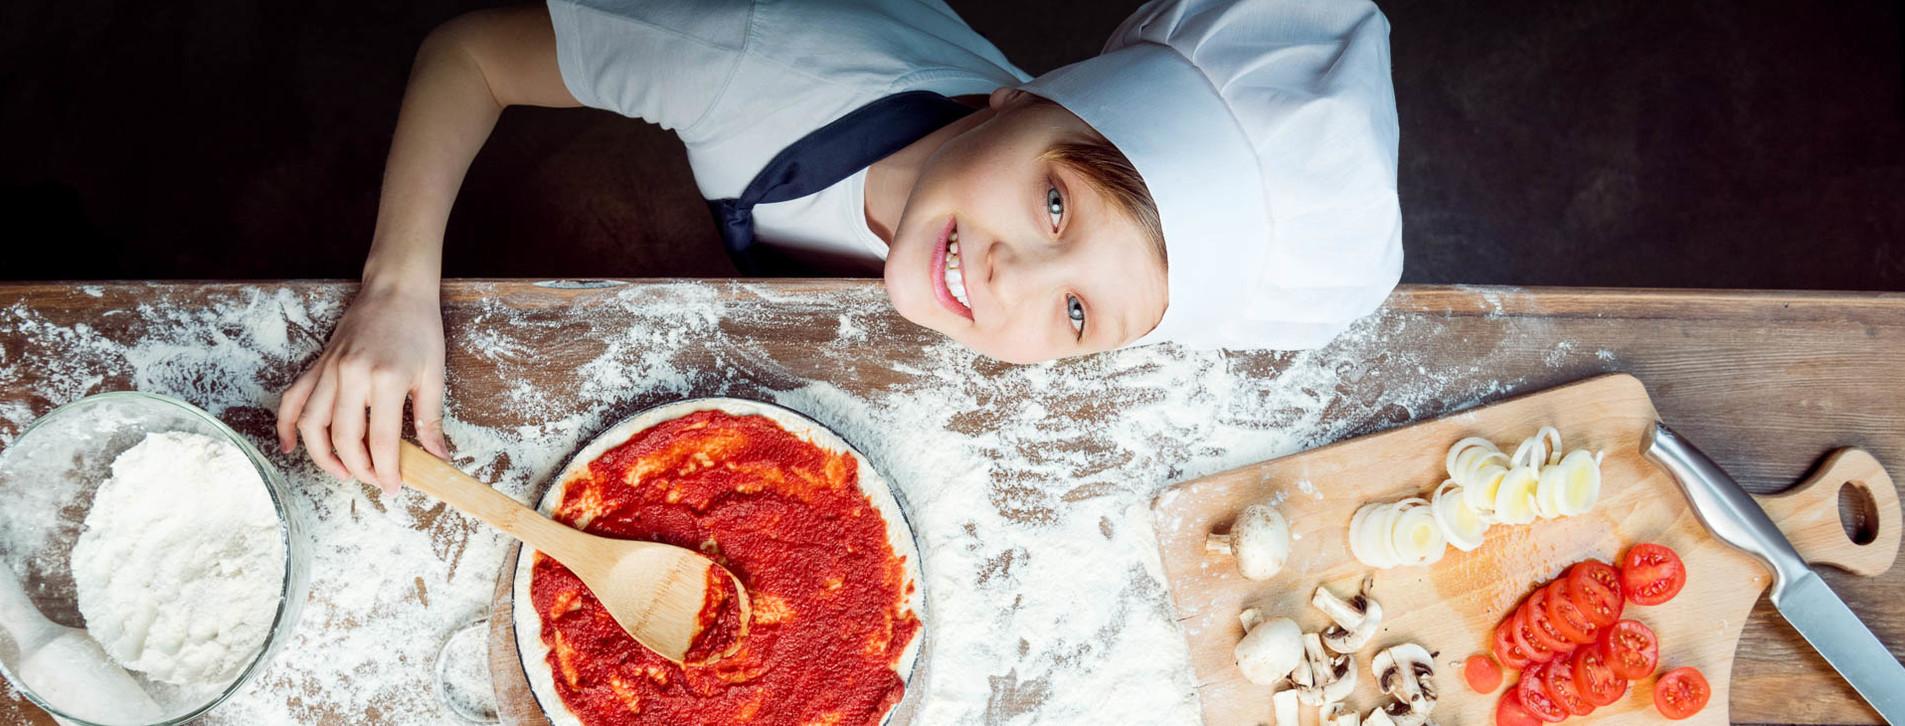 Фото - Детский мастер-класс пиццы